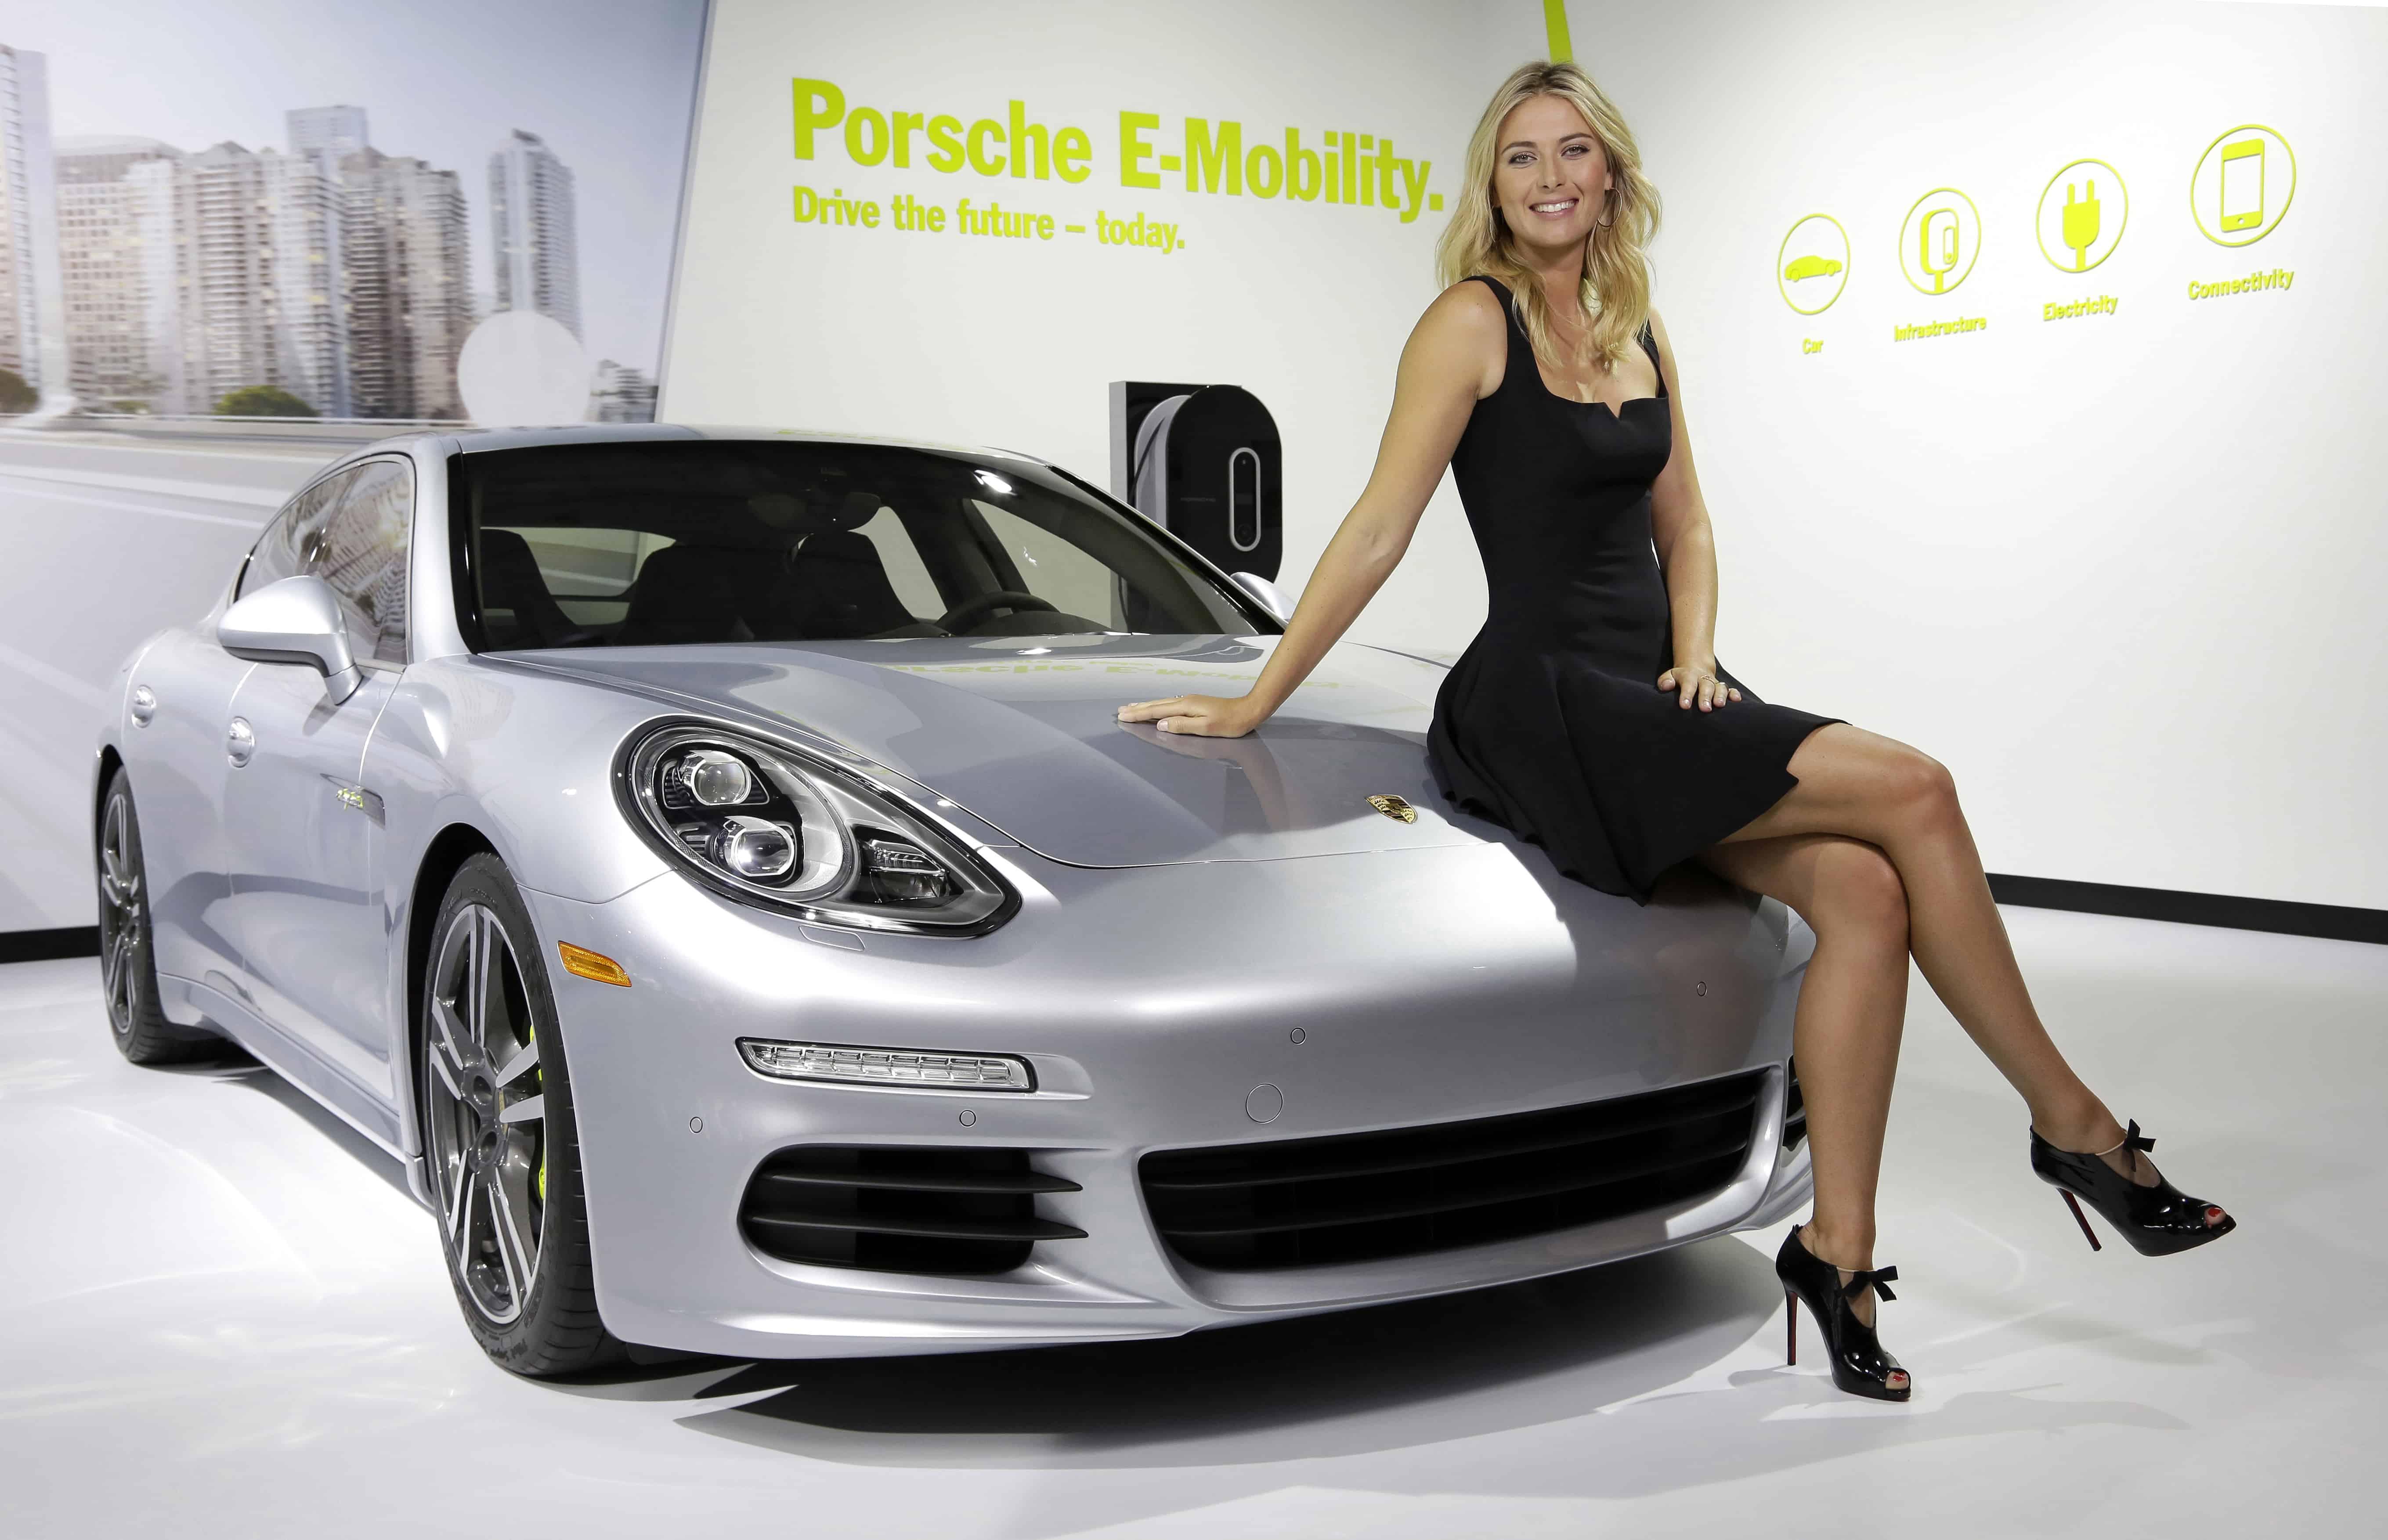 Maria Sharapova était ambassadrice de Porsche depuis 2013